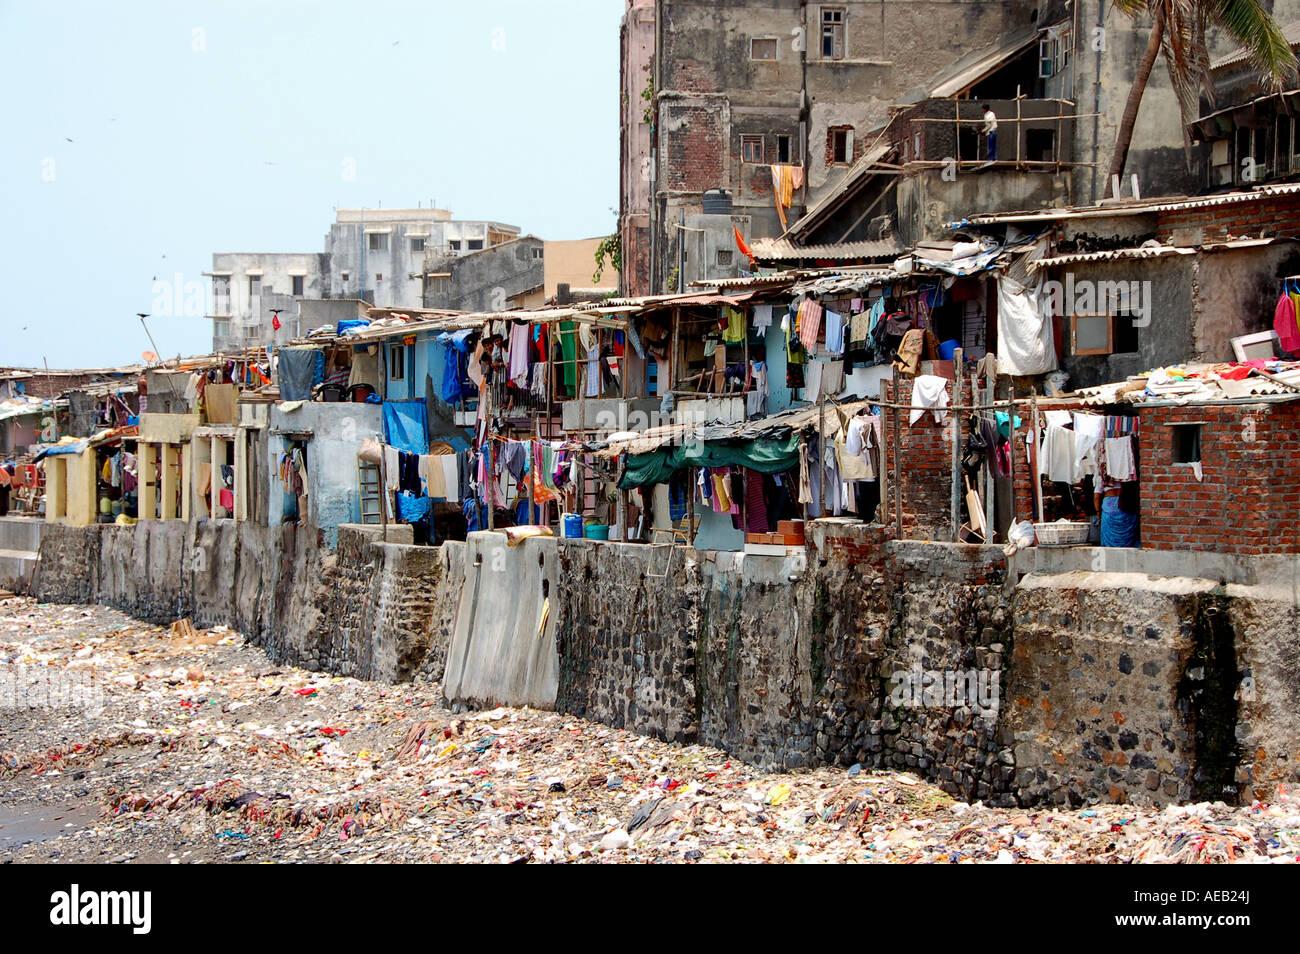 Shanty town - Wikipedia